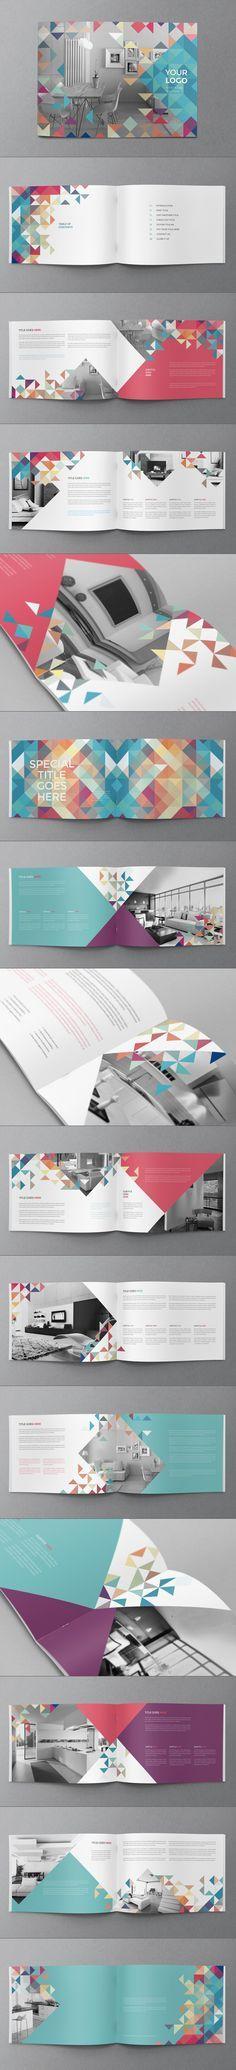 Minimal Colorful Brochure. Download here: http://graphicriver.net/item/minimal-colorful-brochure/8232684?ref=abradesign #design #brochure